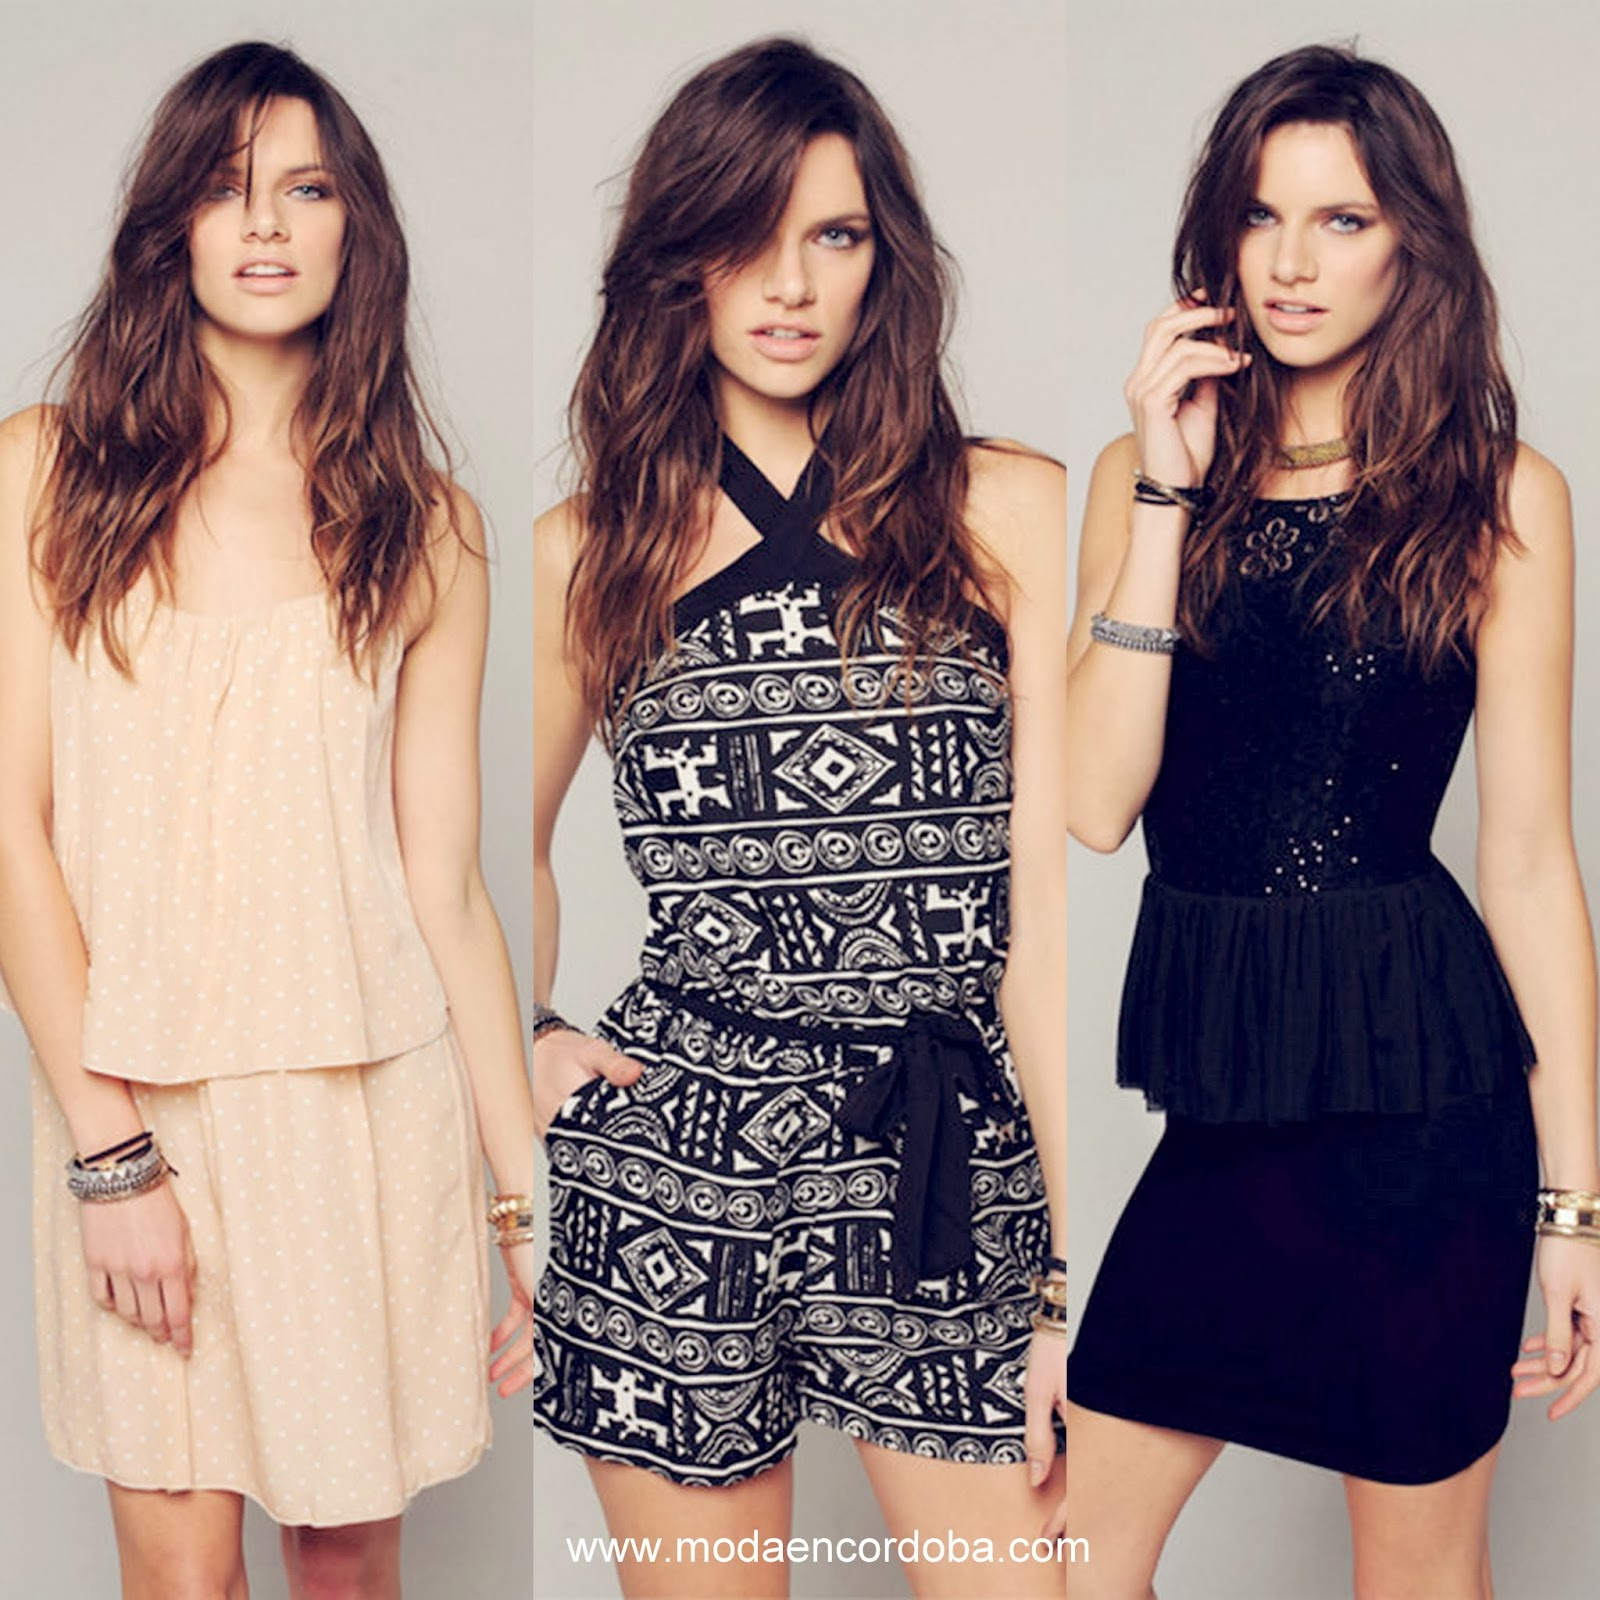 Ropa Femenina de Moda 2014 Moda Mab Ropa Femenina Con